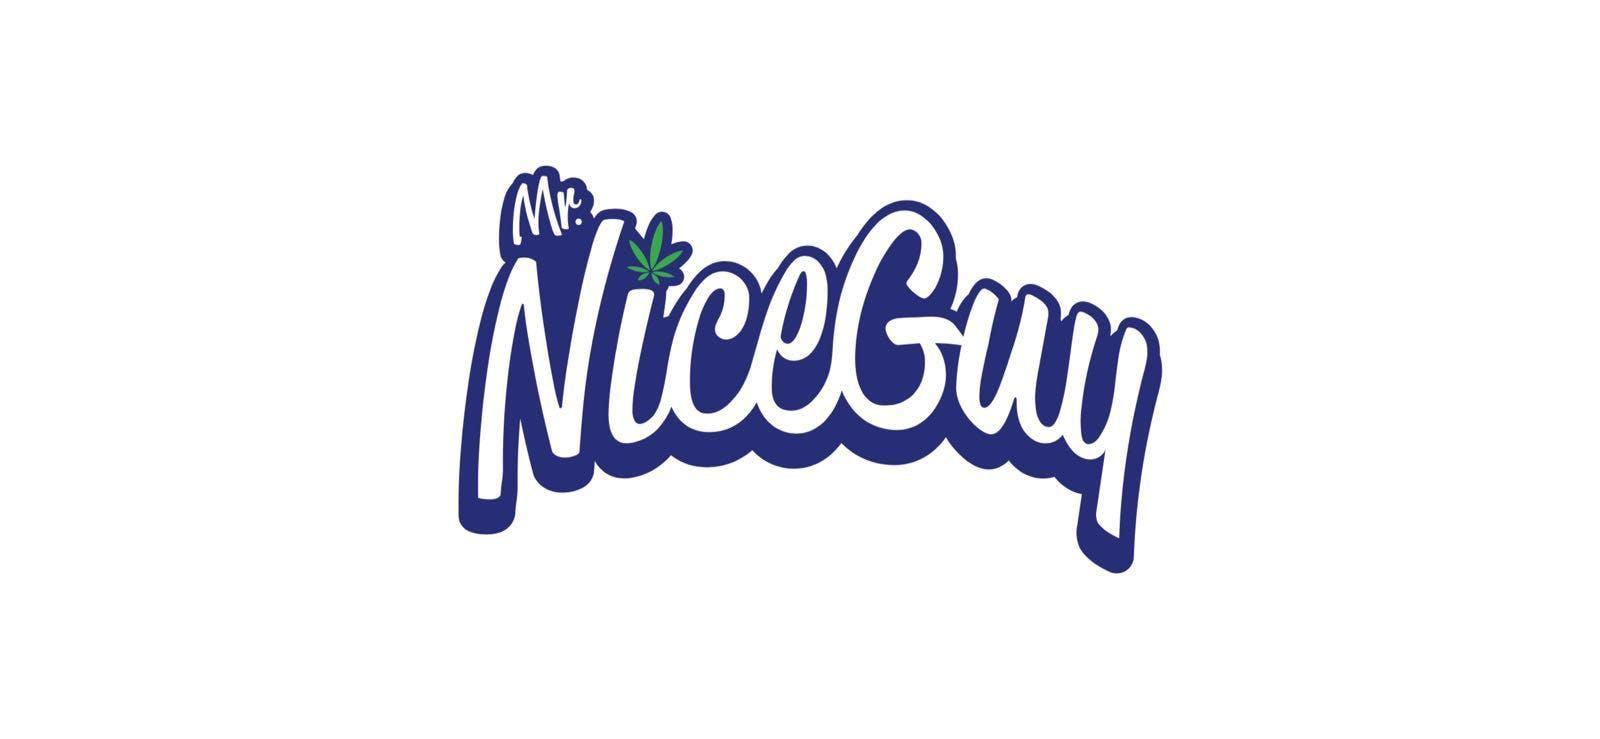 Mr Nice Guy.jpg